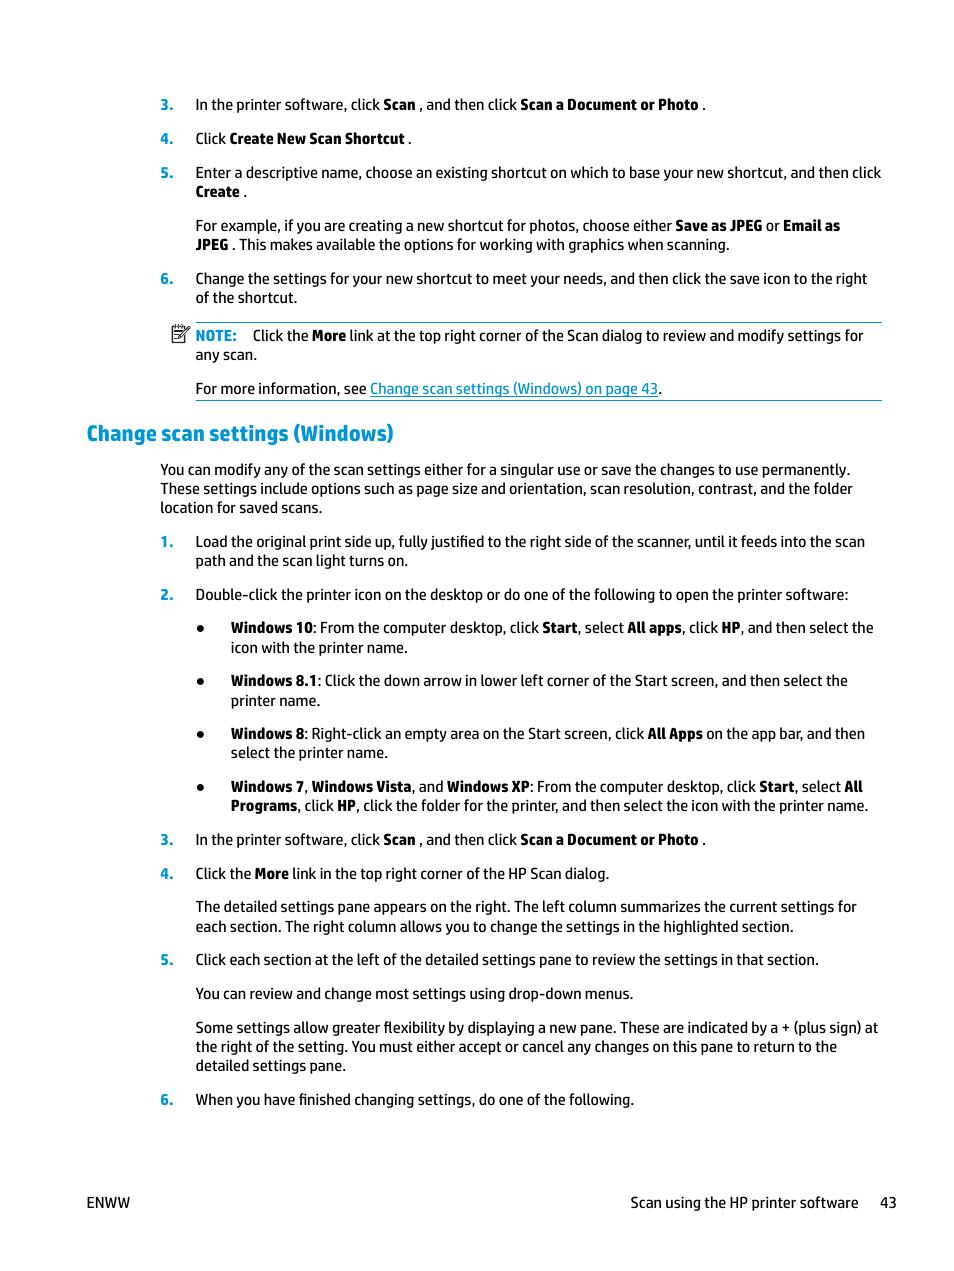 Change scan settings (windows), Tion, see | HP DeskJet ...